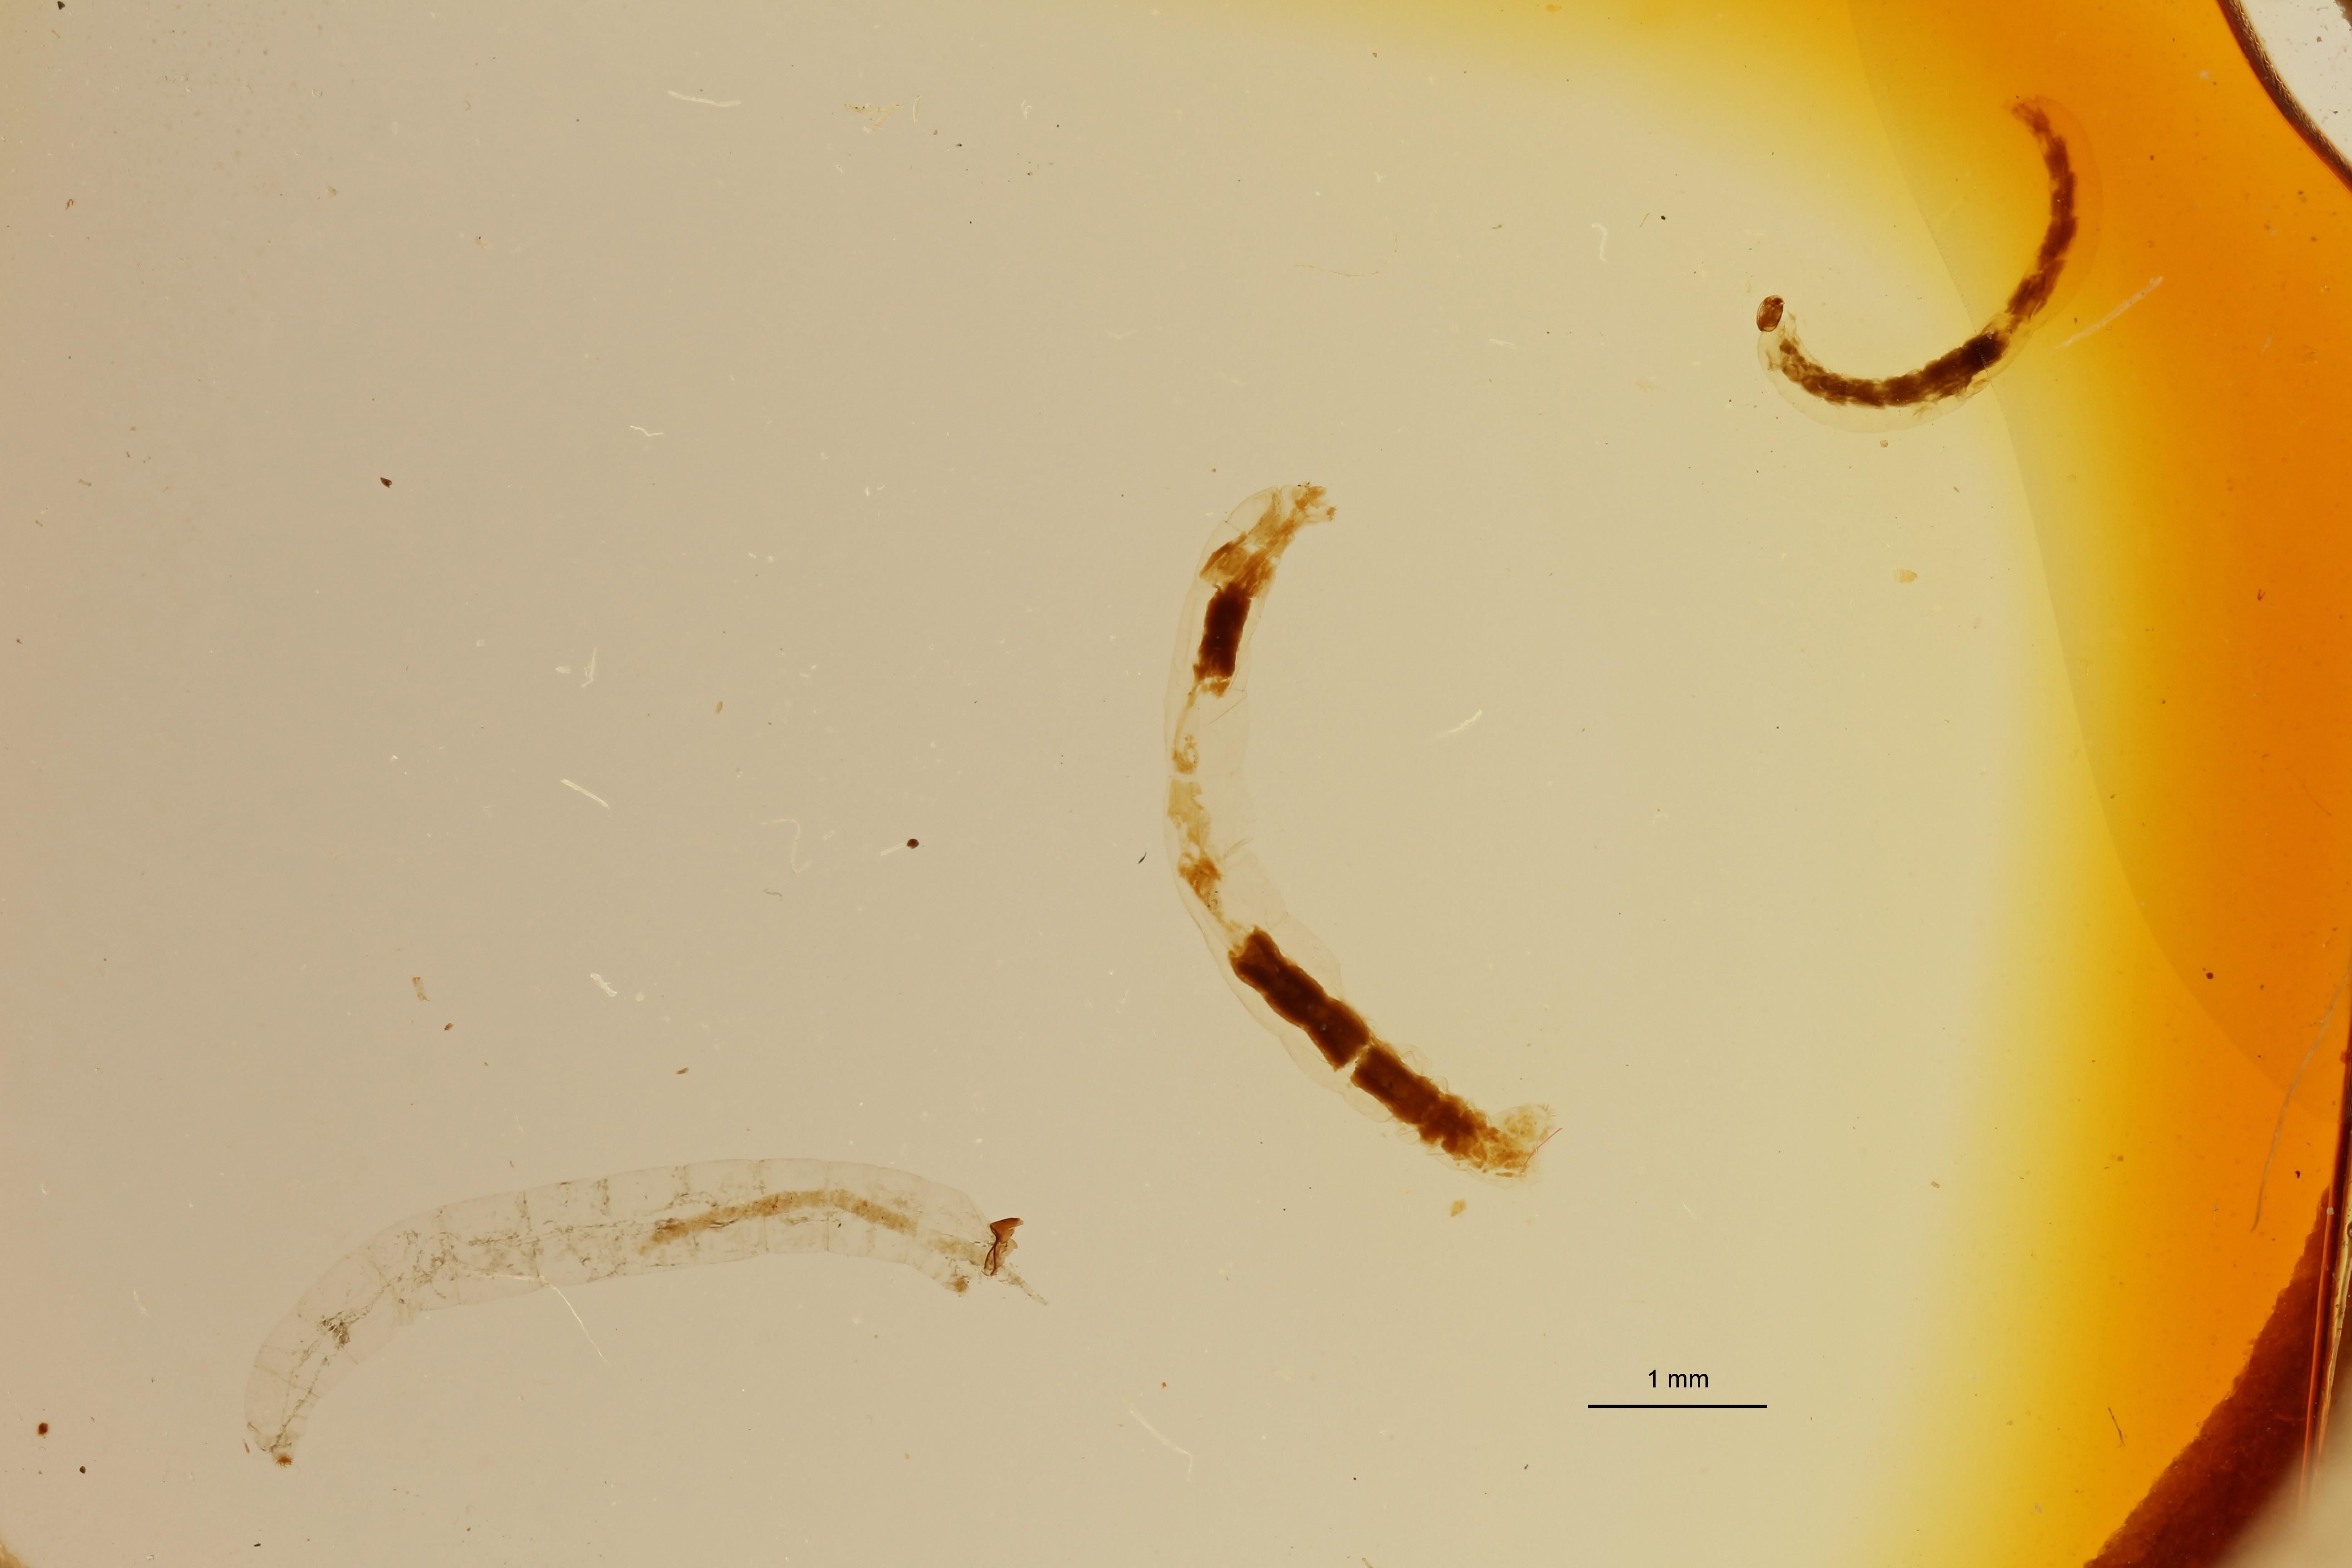 Belgica antarctica 1 Larva 1 L ZS PMax Scaled.jpeg